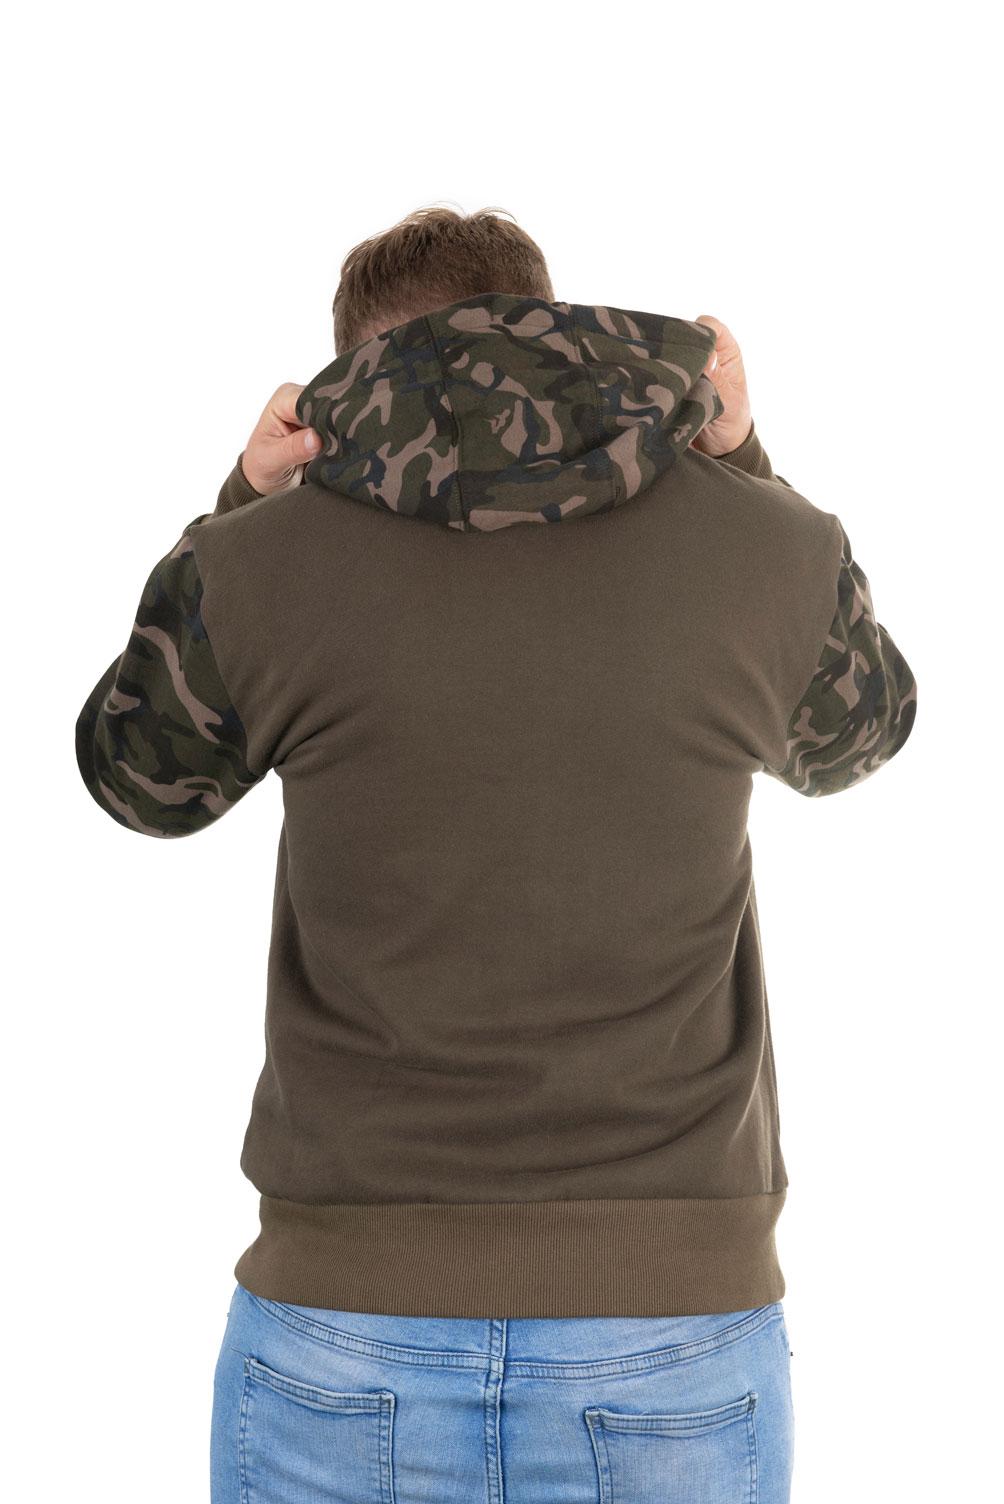 khaki_camo_hoodie_back_2jpg